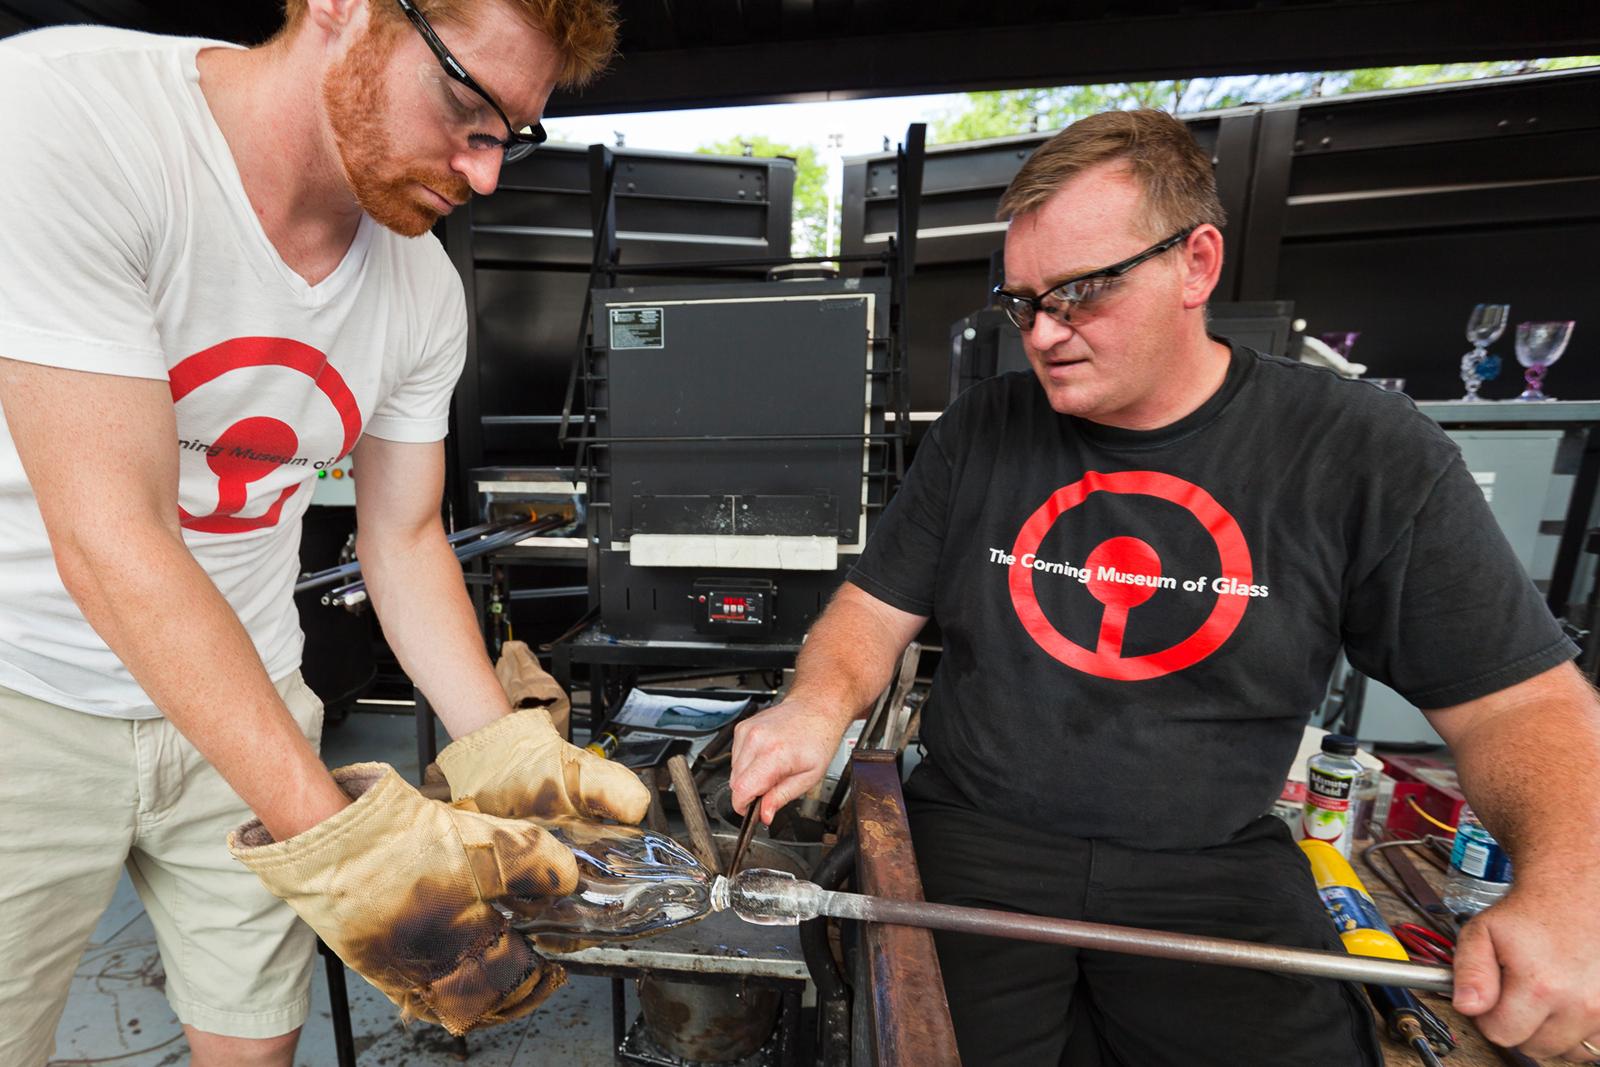 Gaffers George Kennard and Dane Jack work with designer Tom Scott at GlassLab in Corning